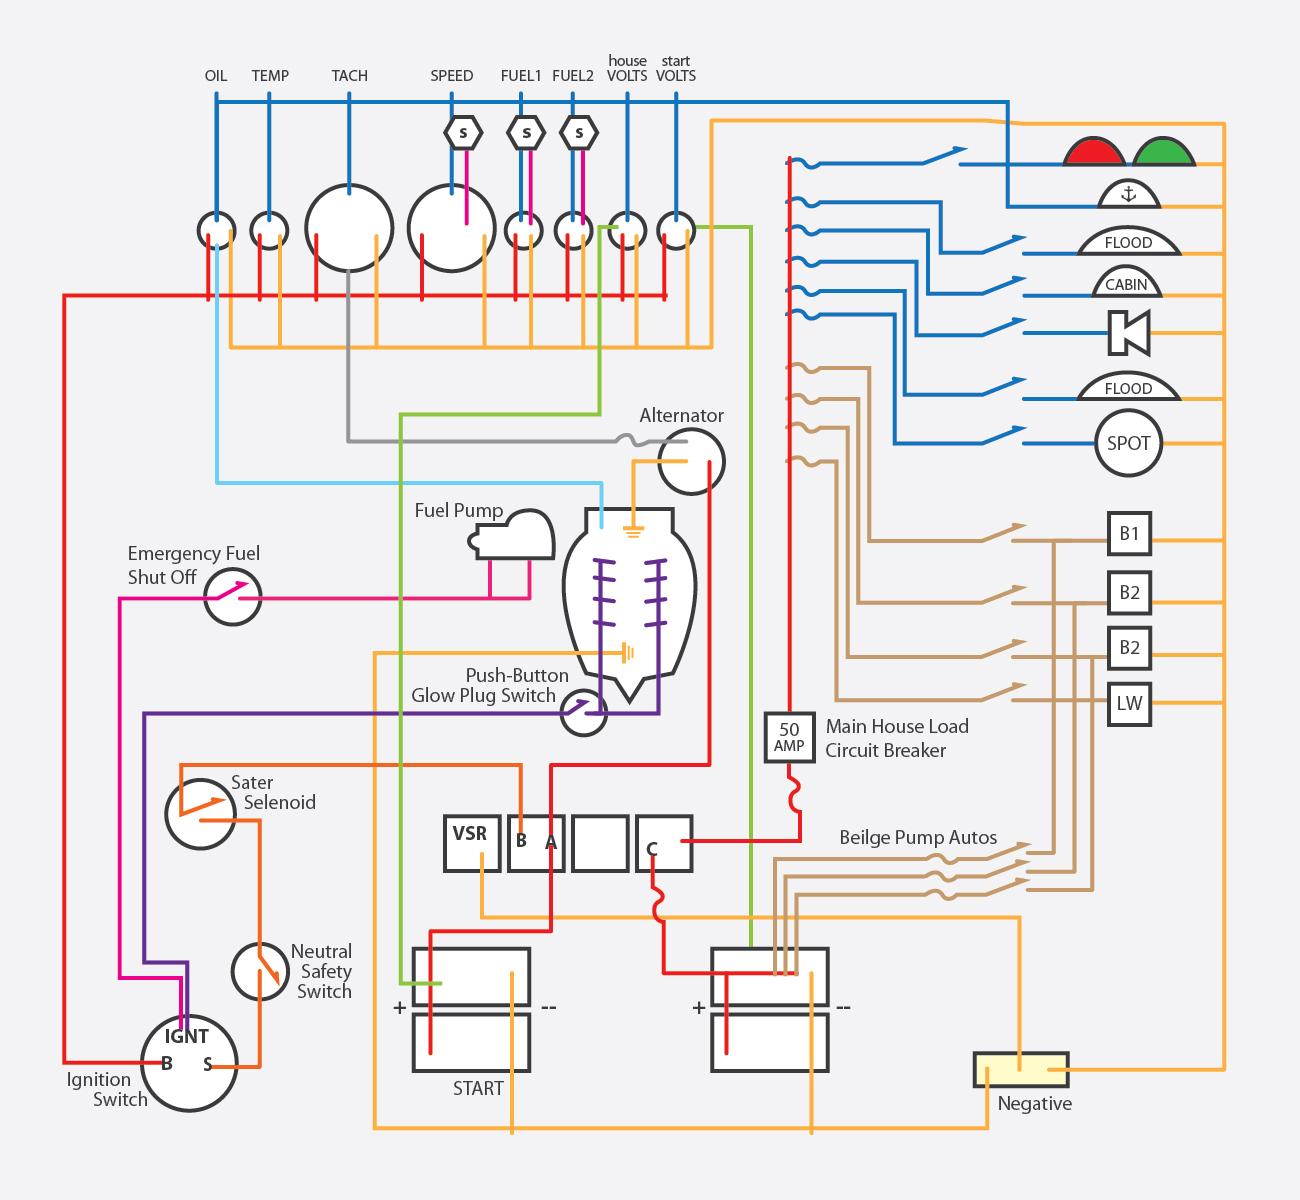 hight resolution of inboard wiring diagram wiring diagrams tar omc inboard wiring diagram inboard wiring diagram